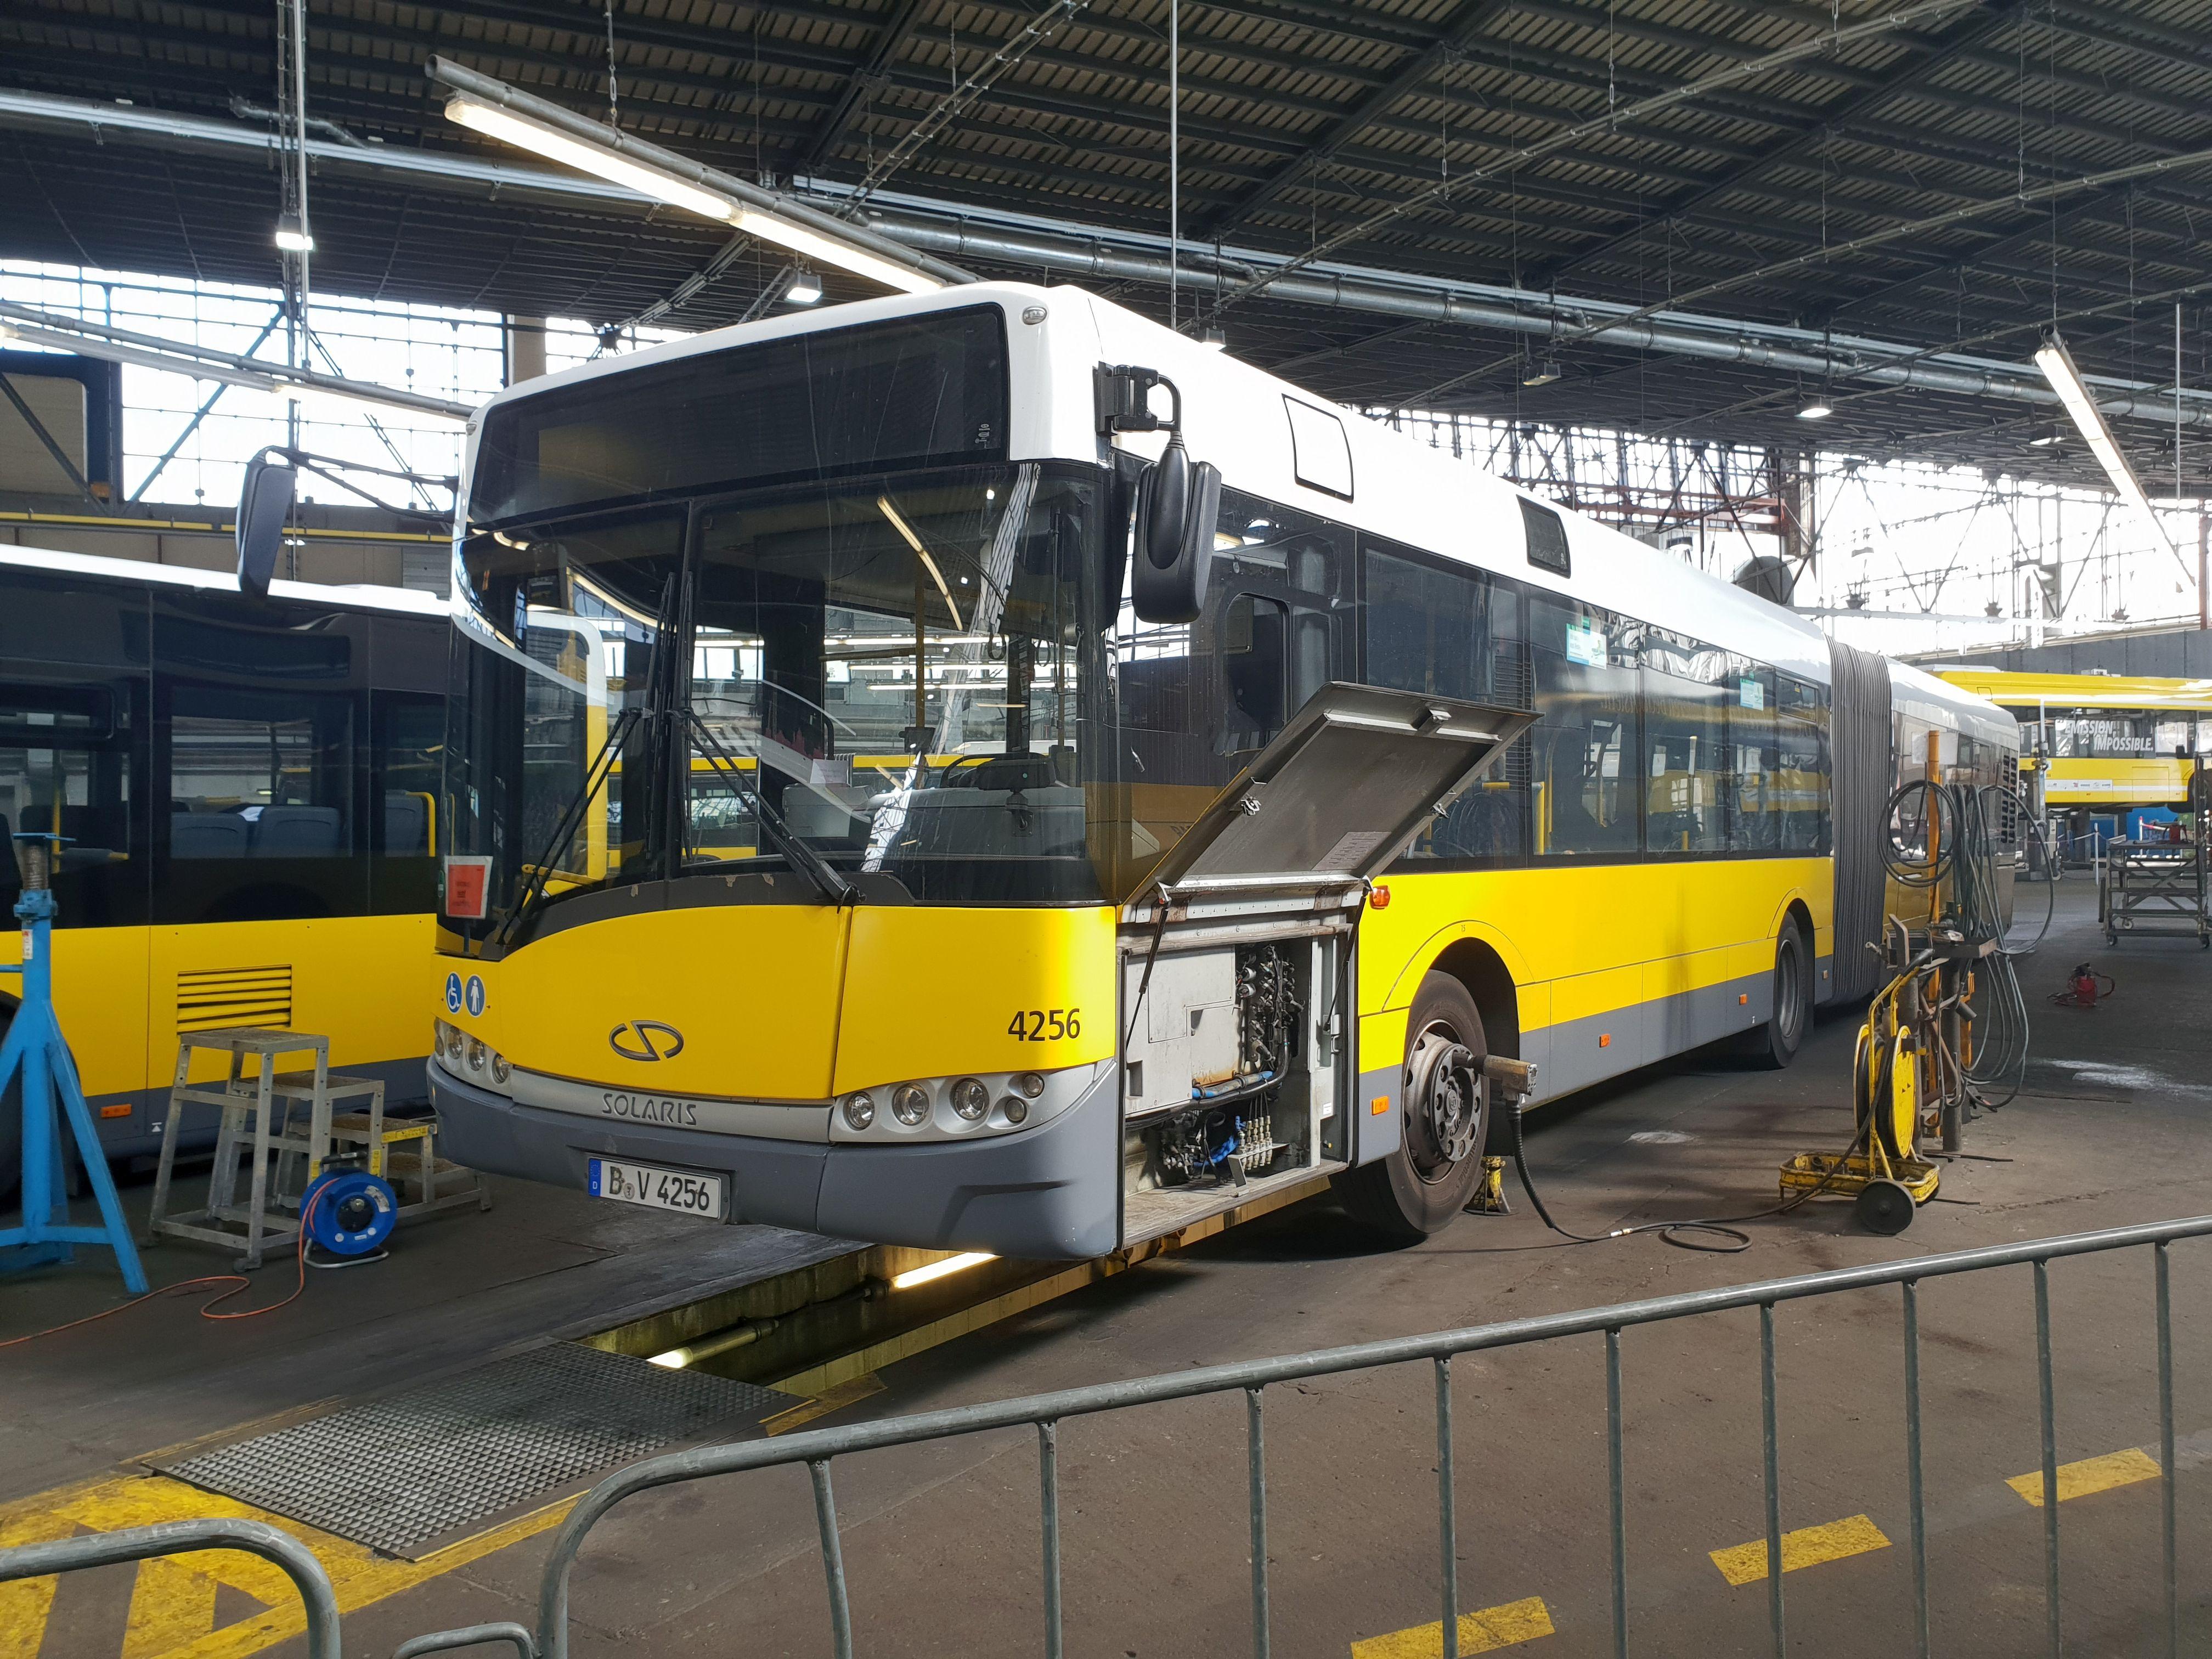 Foto: Bus 4256, Typ Solaris Urbino 18, Hof Siegfriedstr., September 2018